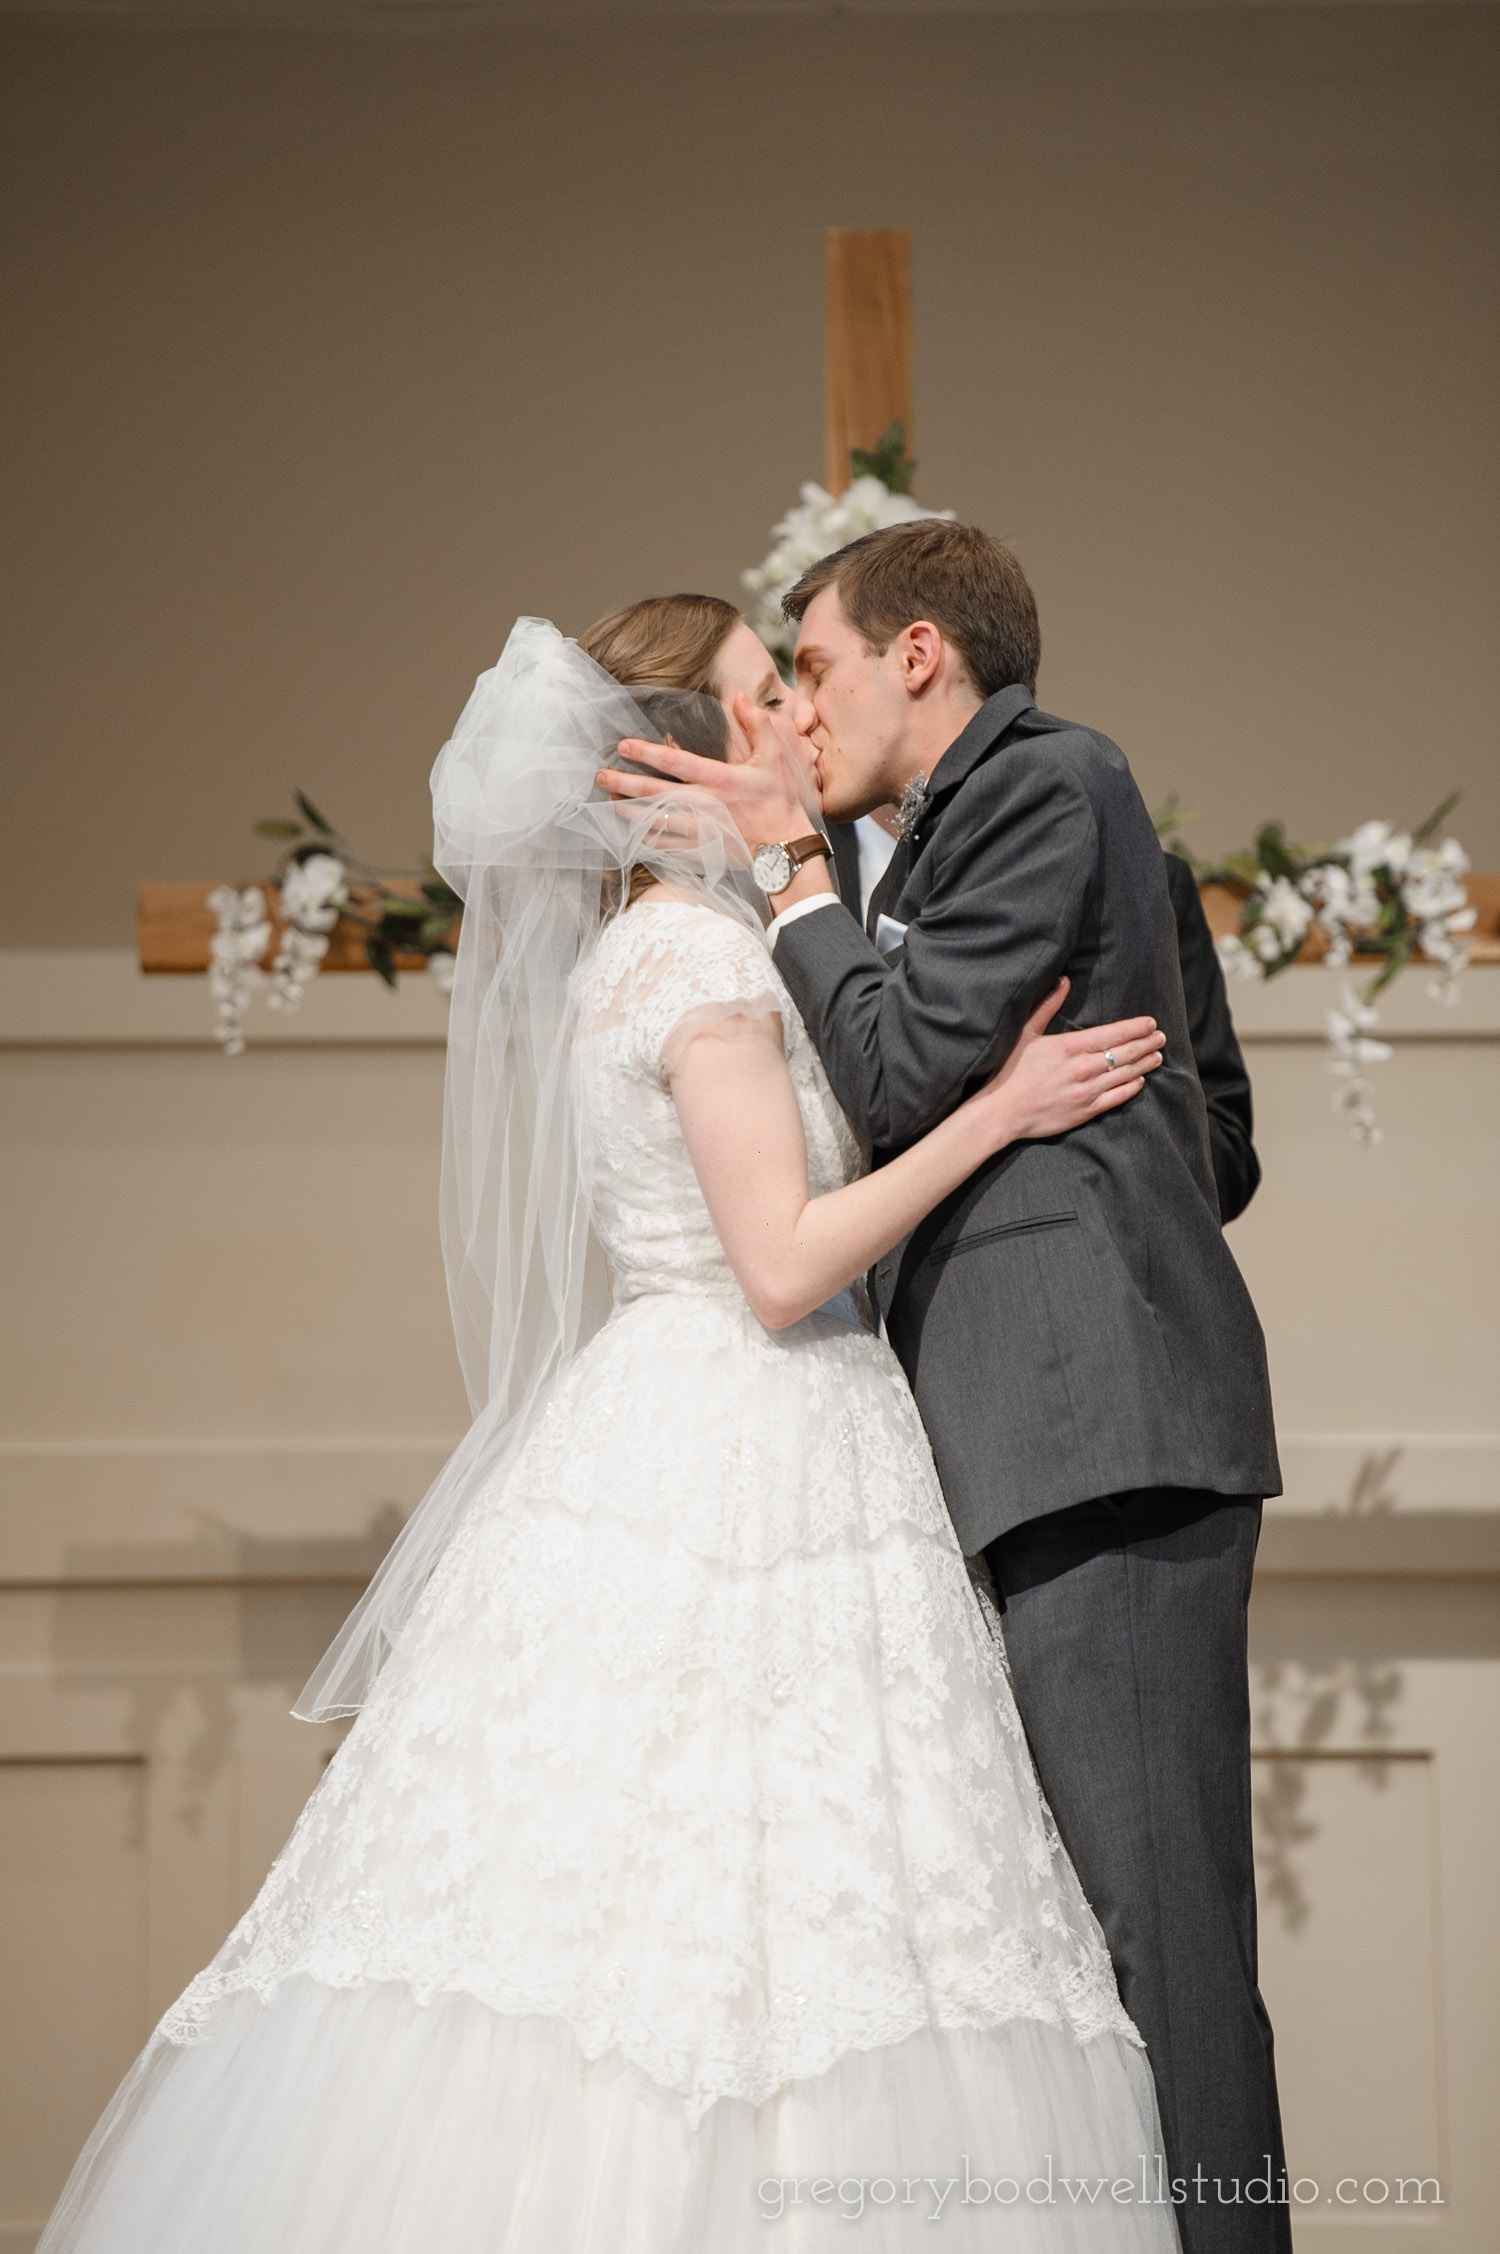 Beaty_Wedding_Blog_018.jpg